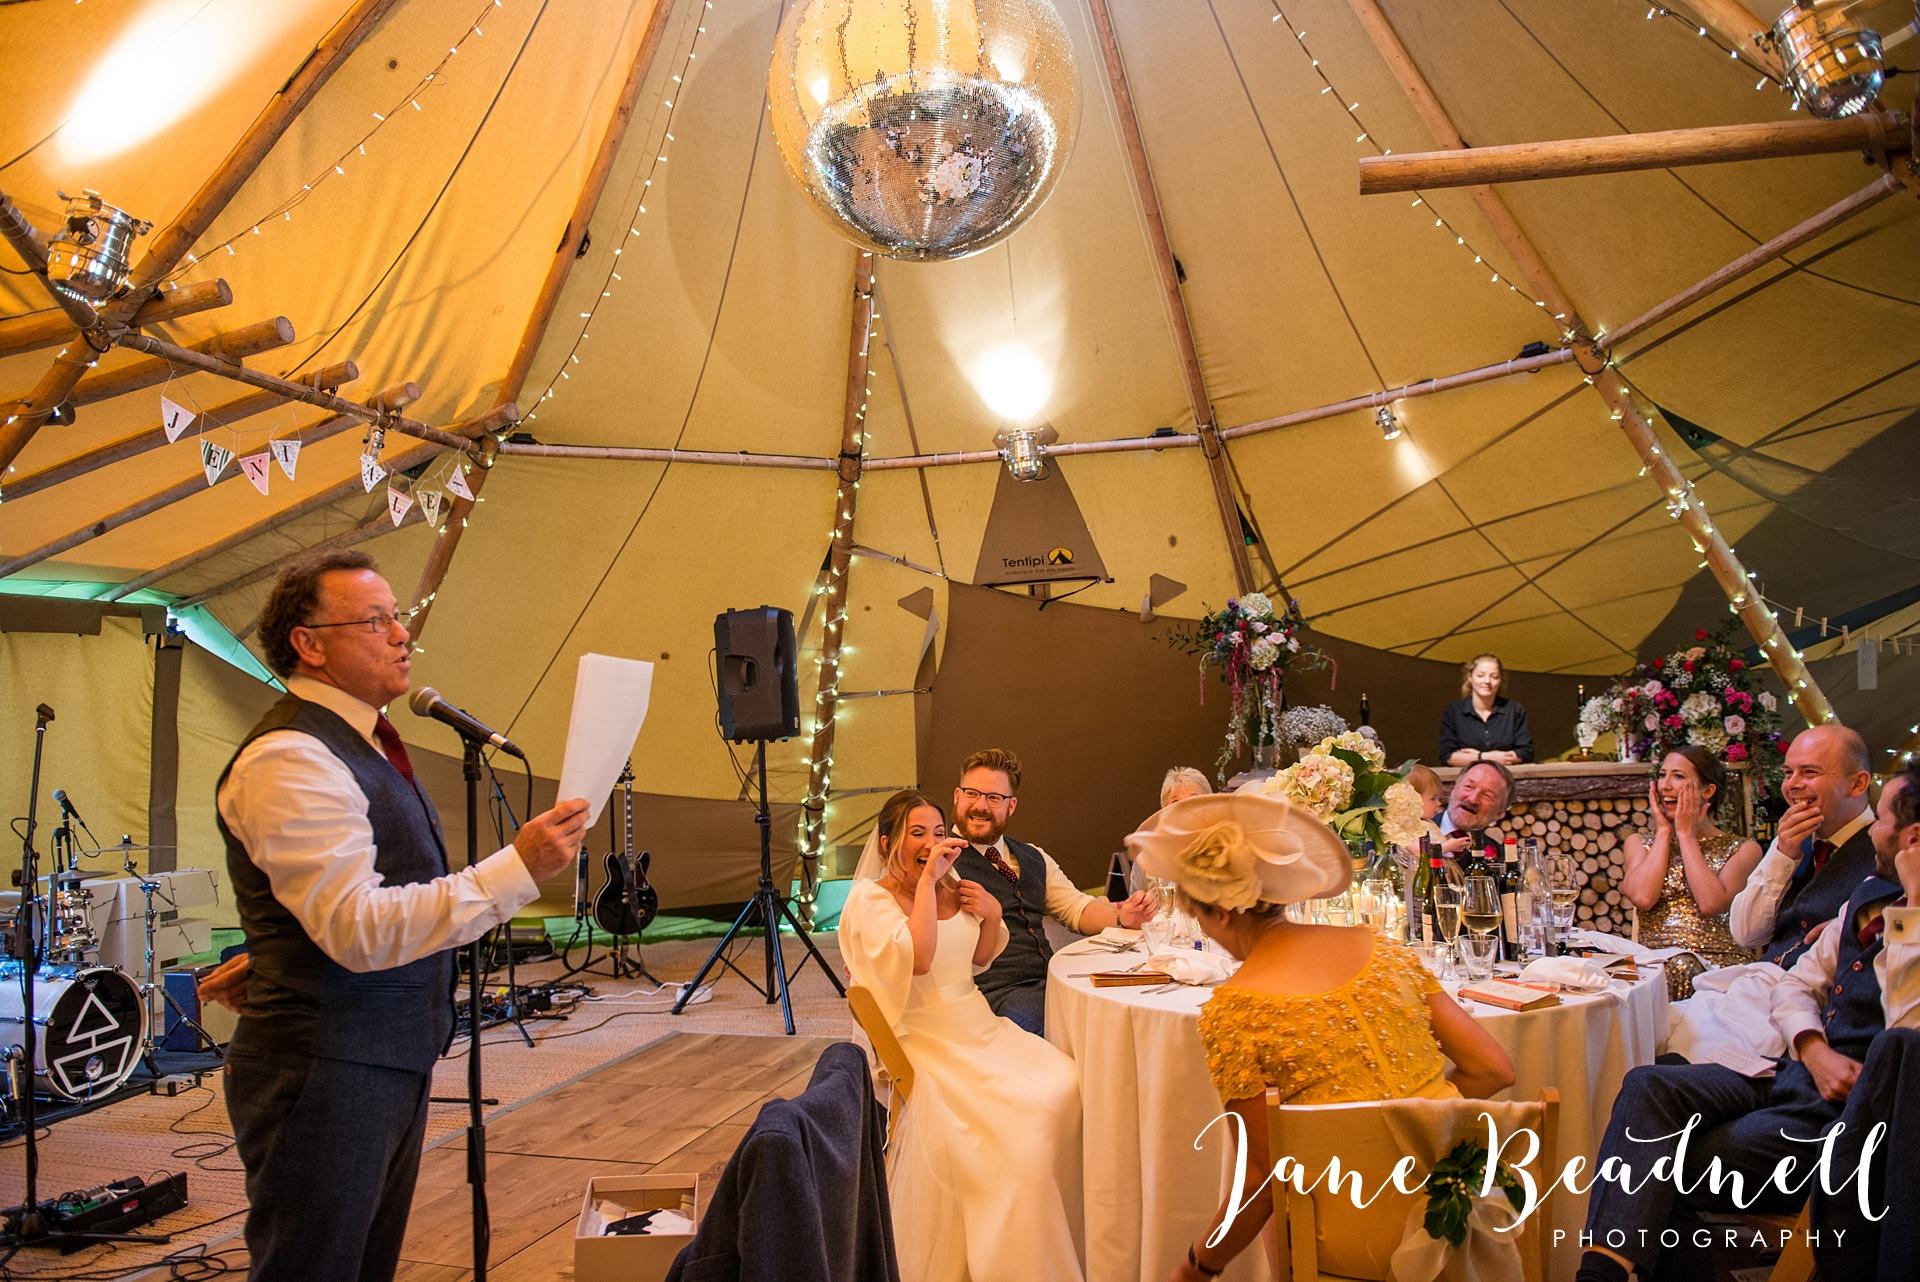 fine-art-wedding-photographer-jane-beadnell-yorkshire-wedding-photographer_0132